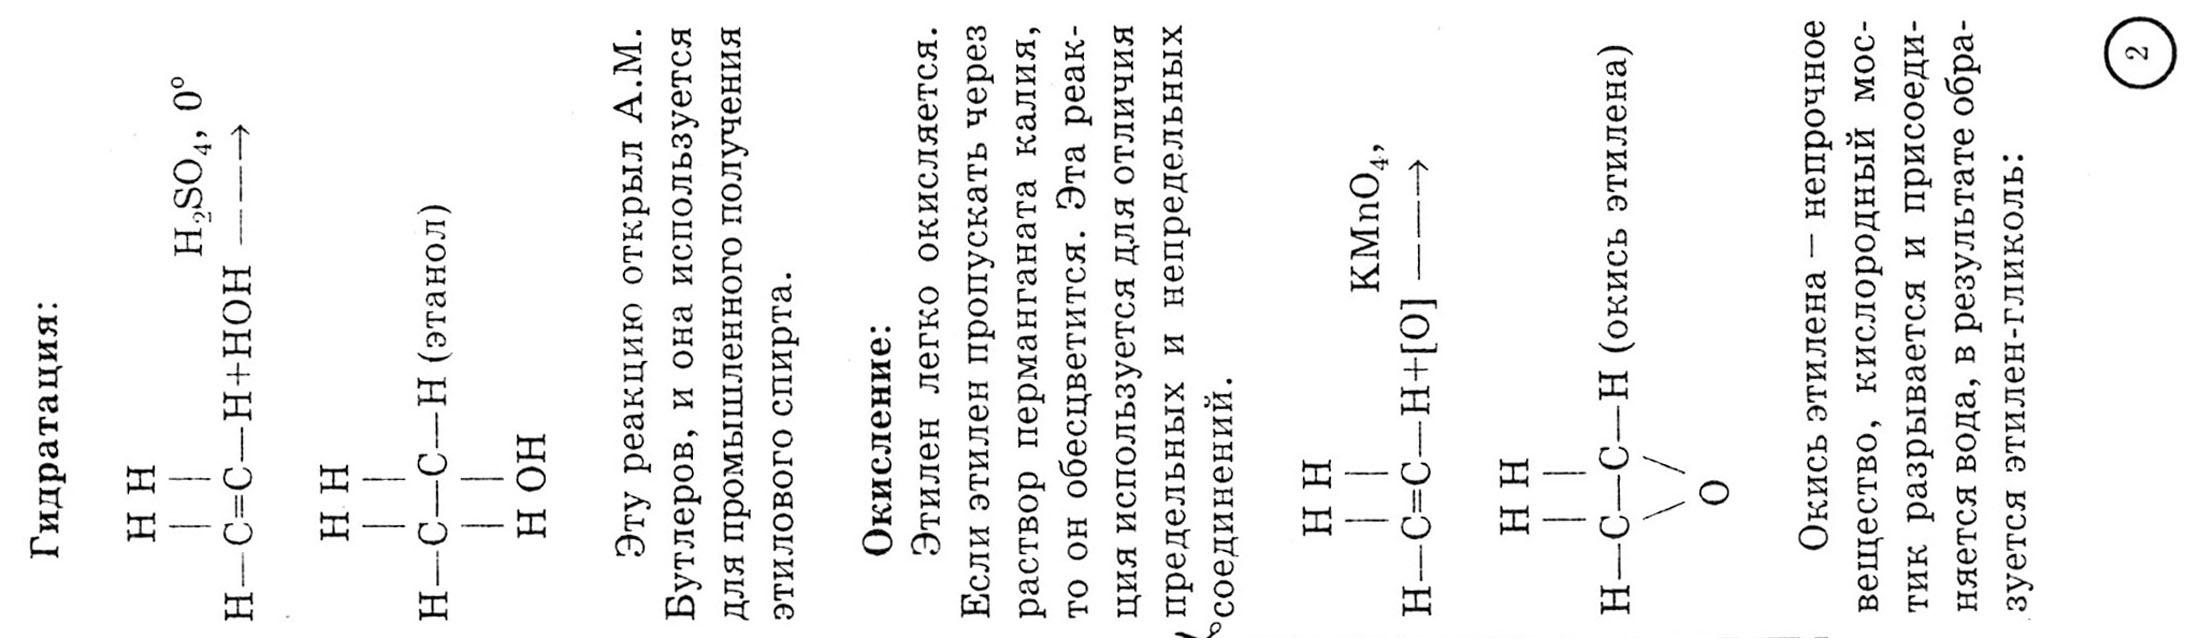 решебник по химии шпора